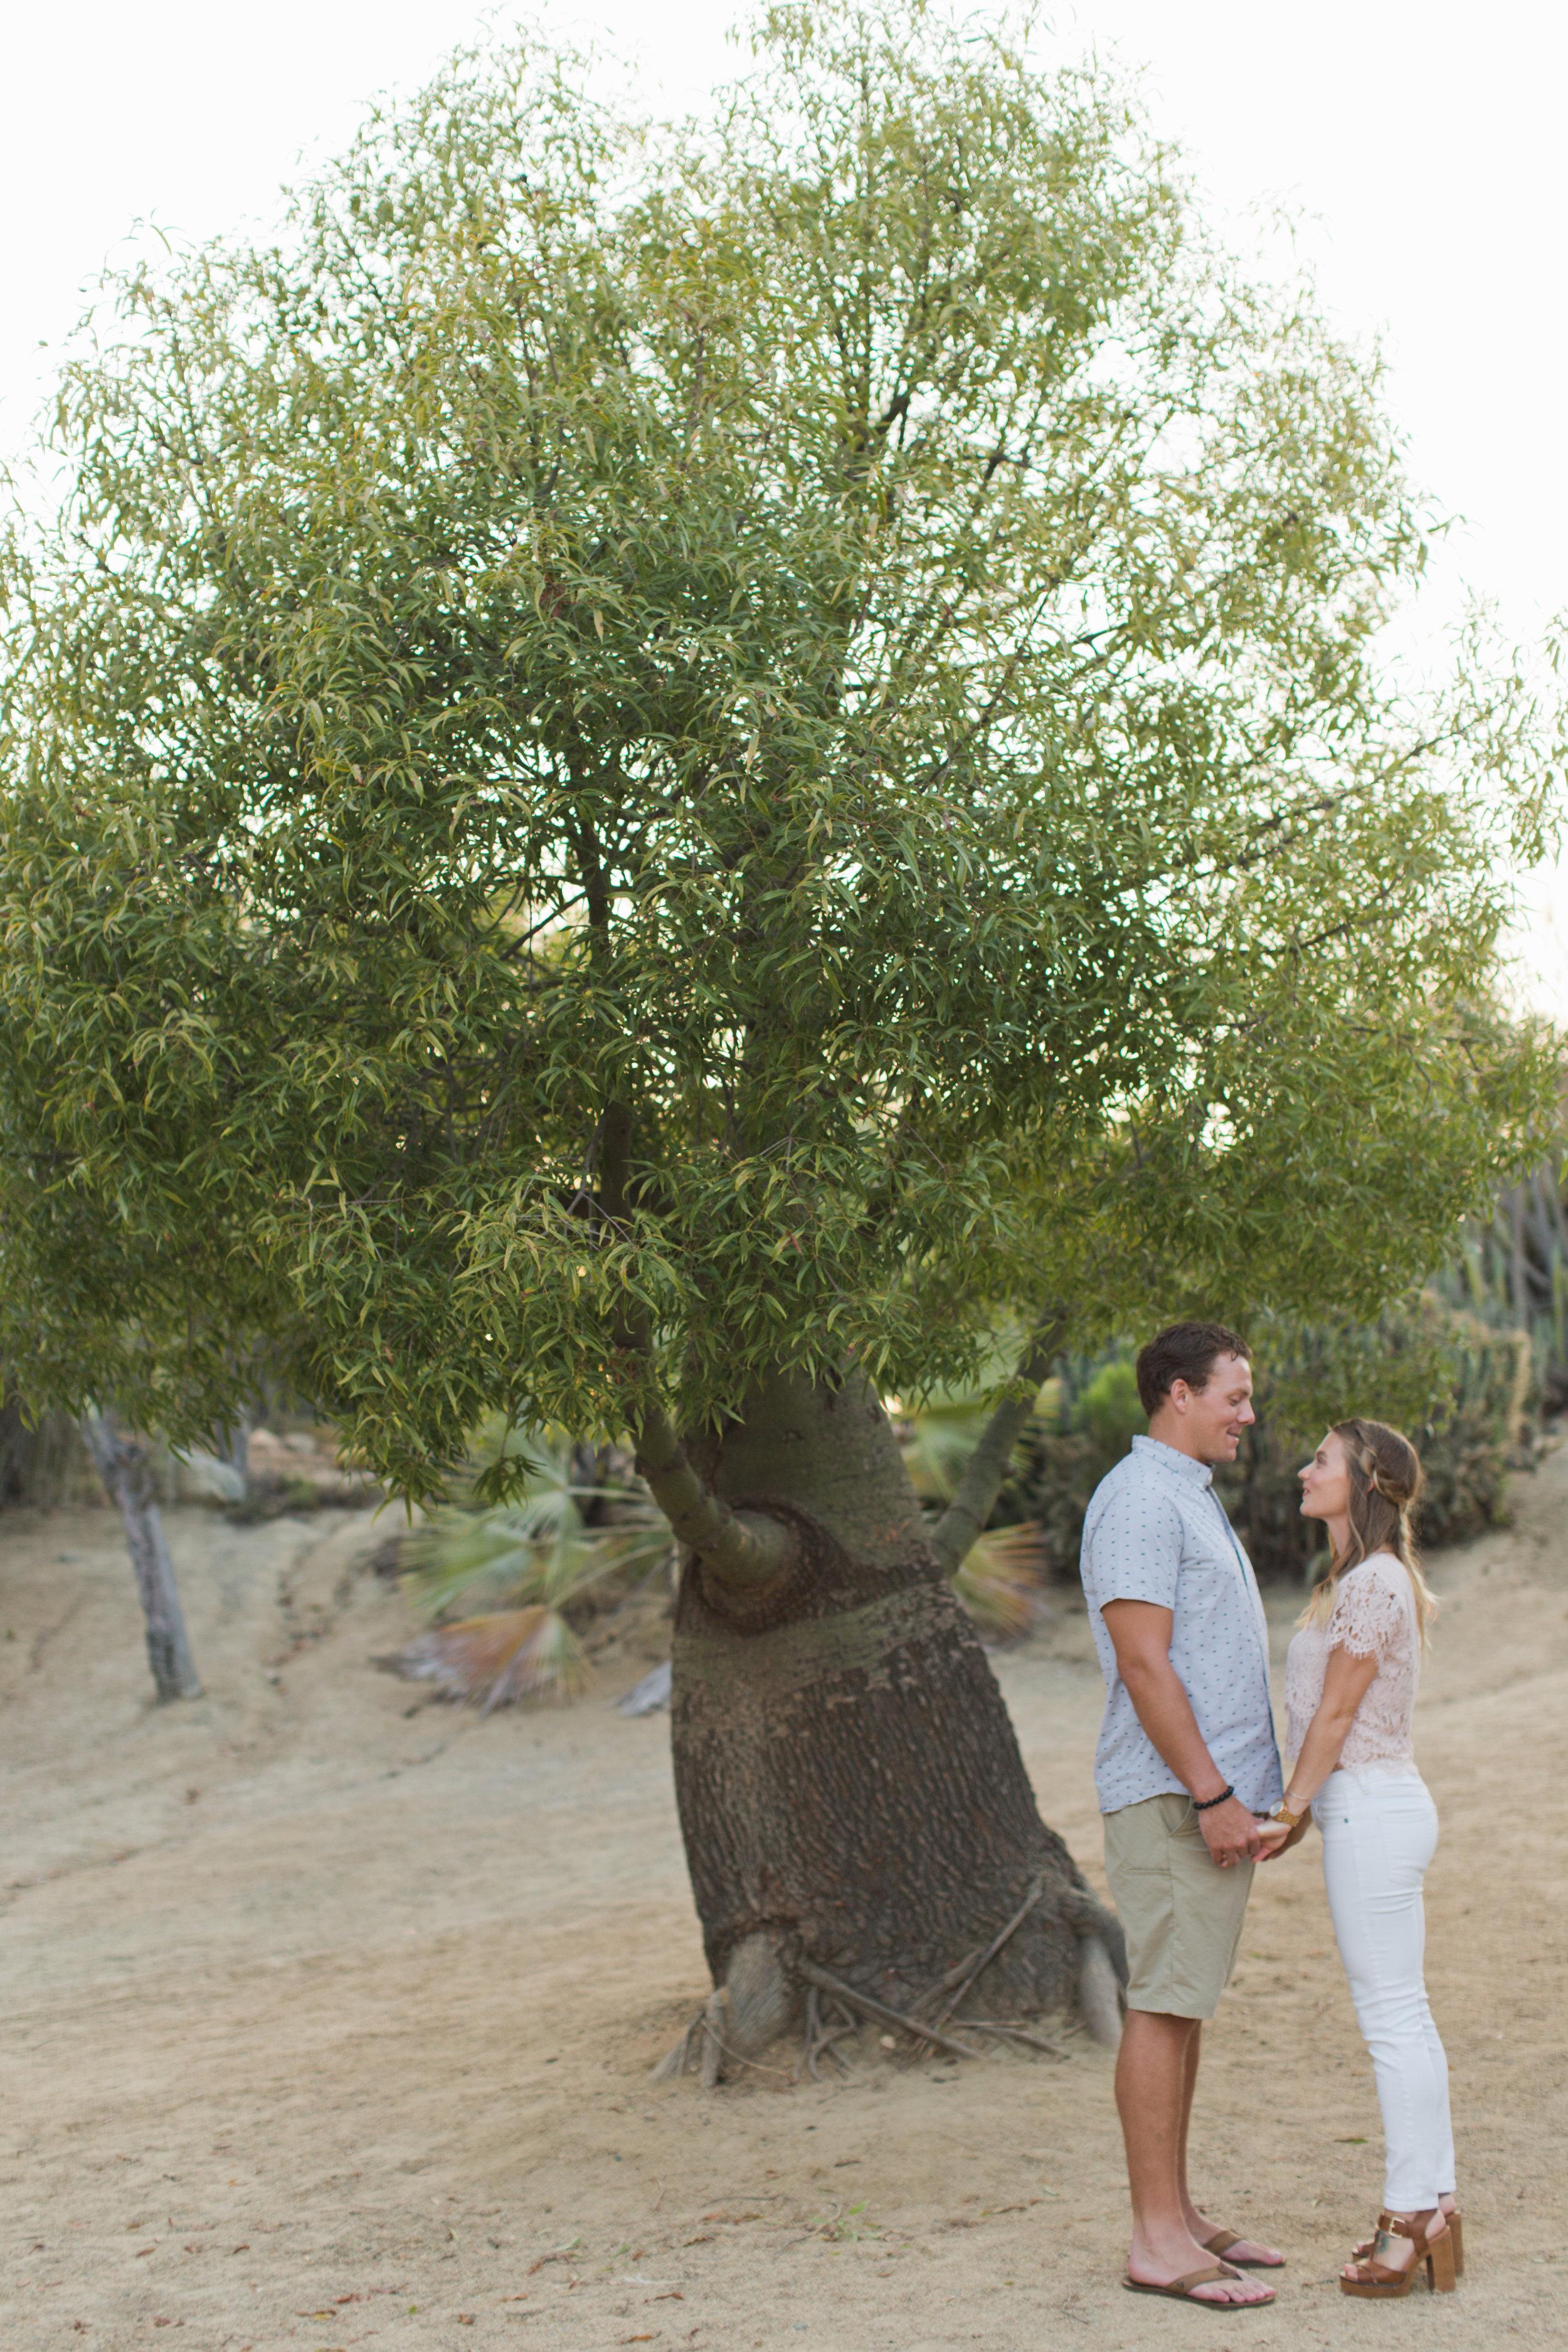 1023.Shewanders.photography.balboa.engagement-1185.jpg